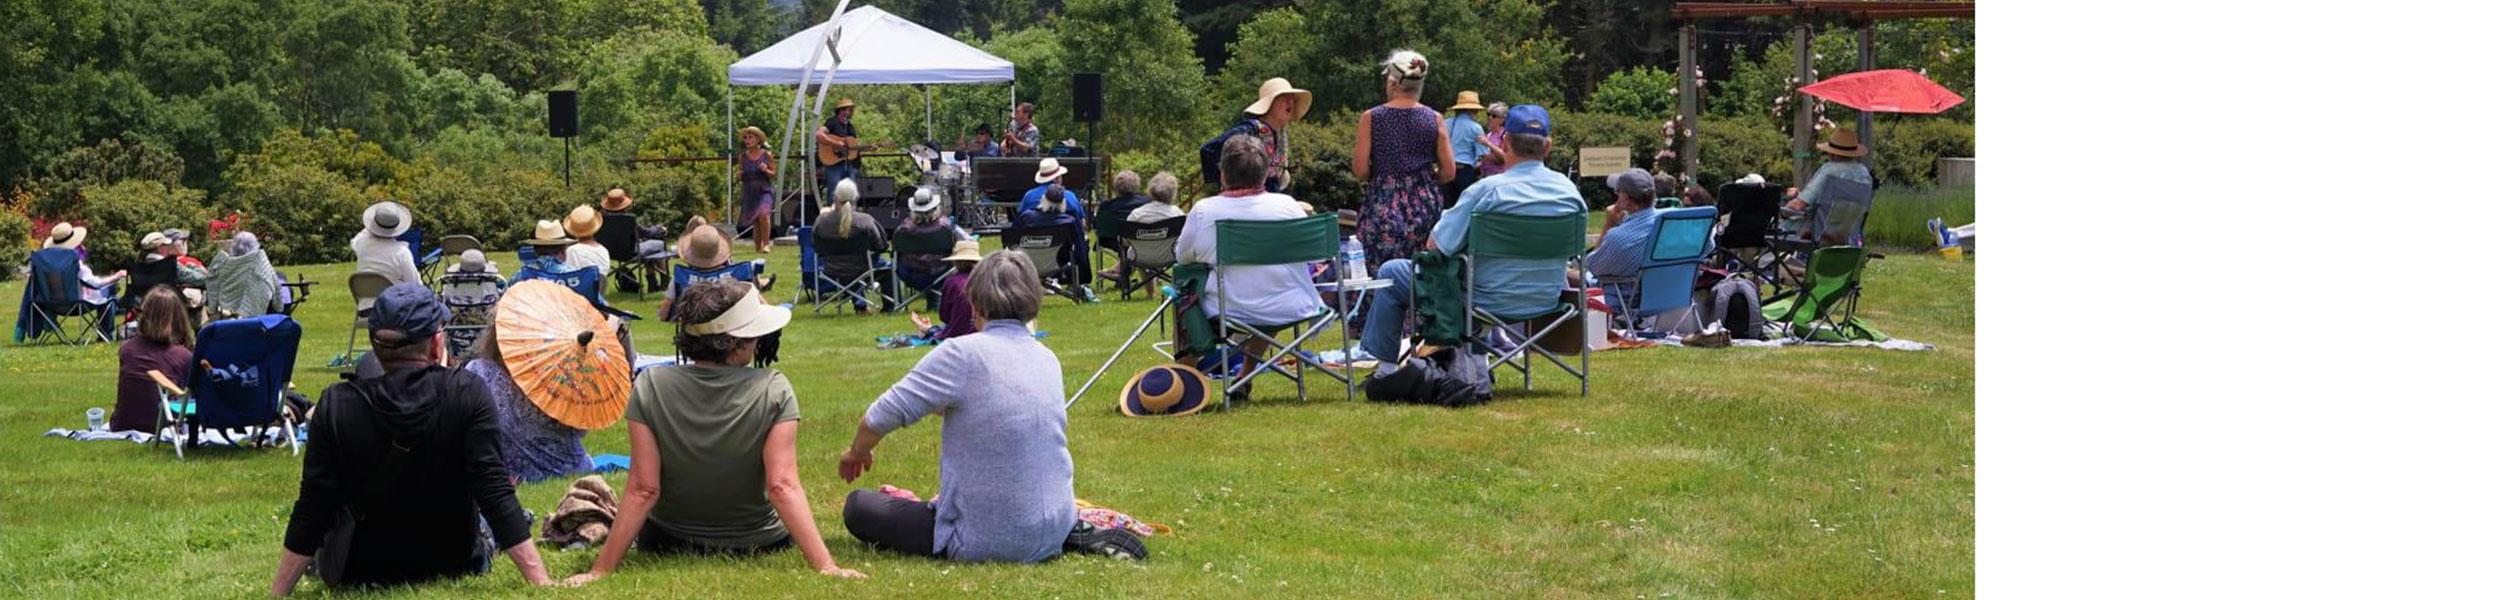 Humboldt Botanical Garden Summer Music Series- James Zeller Trio